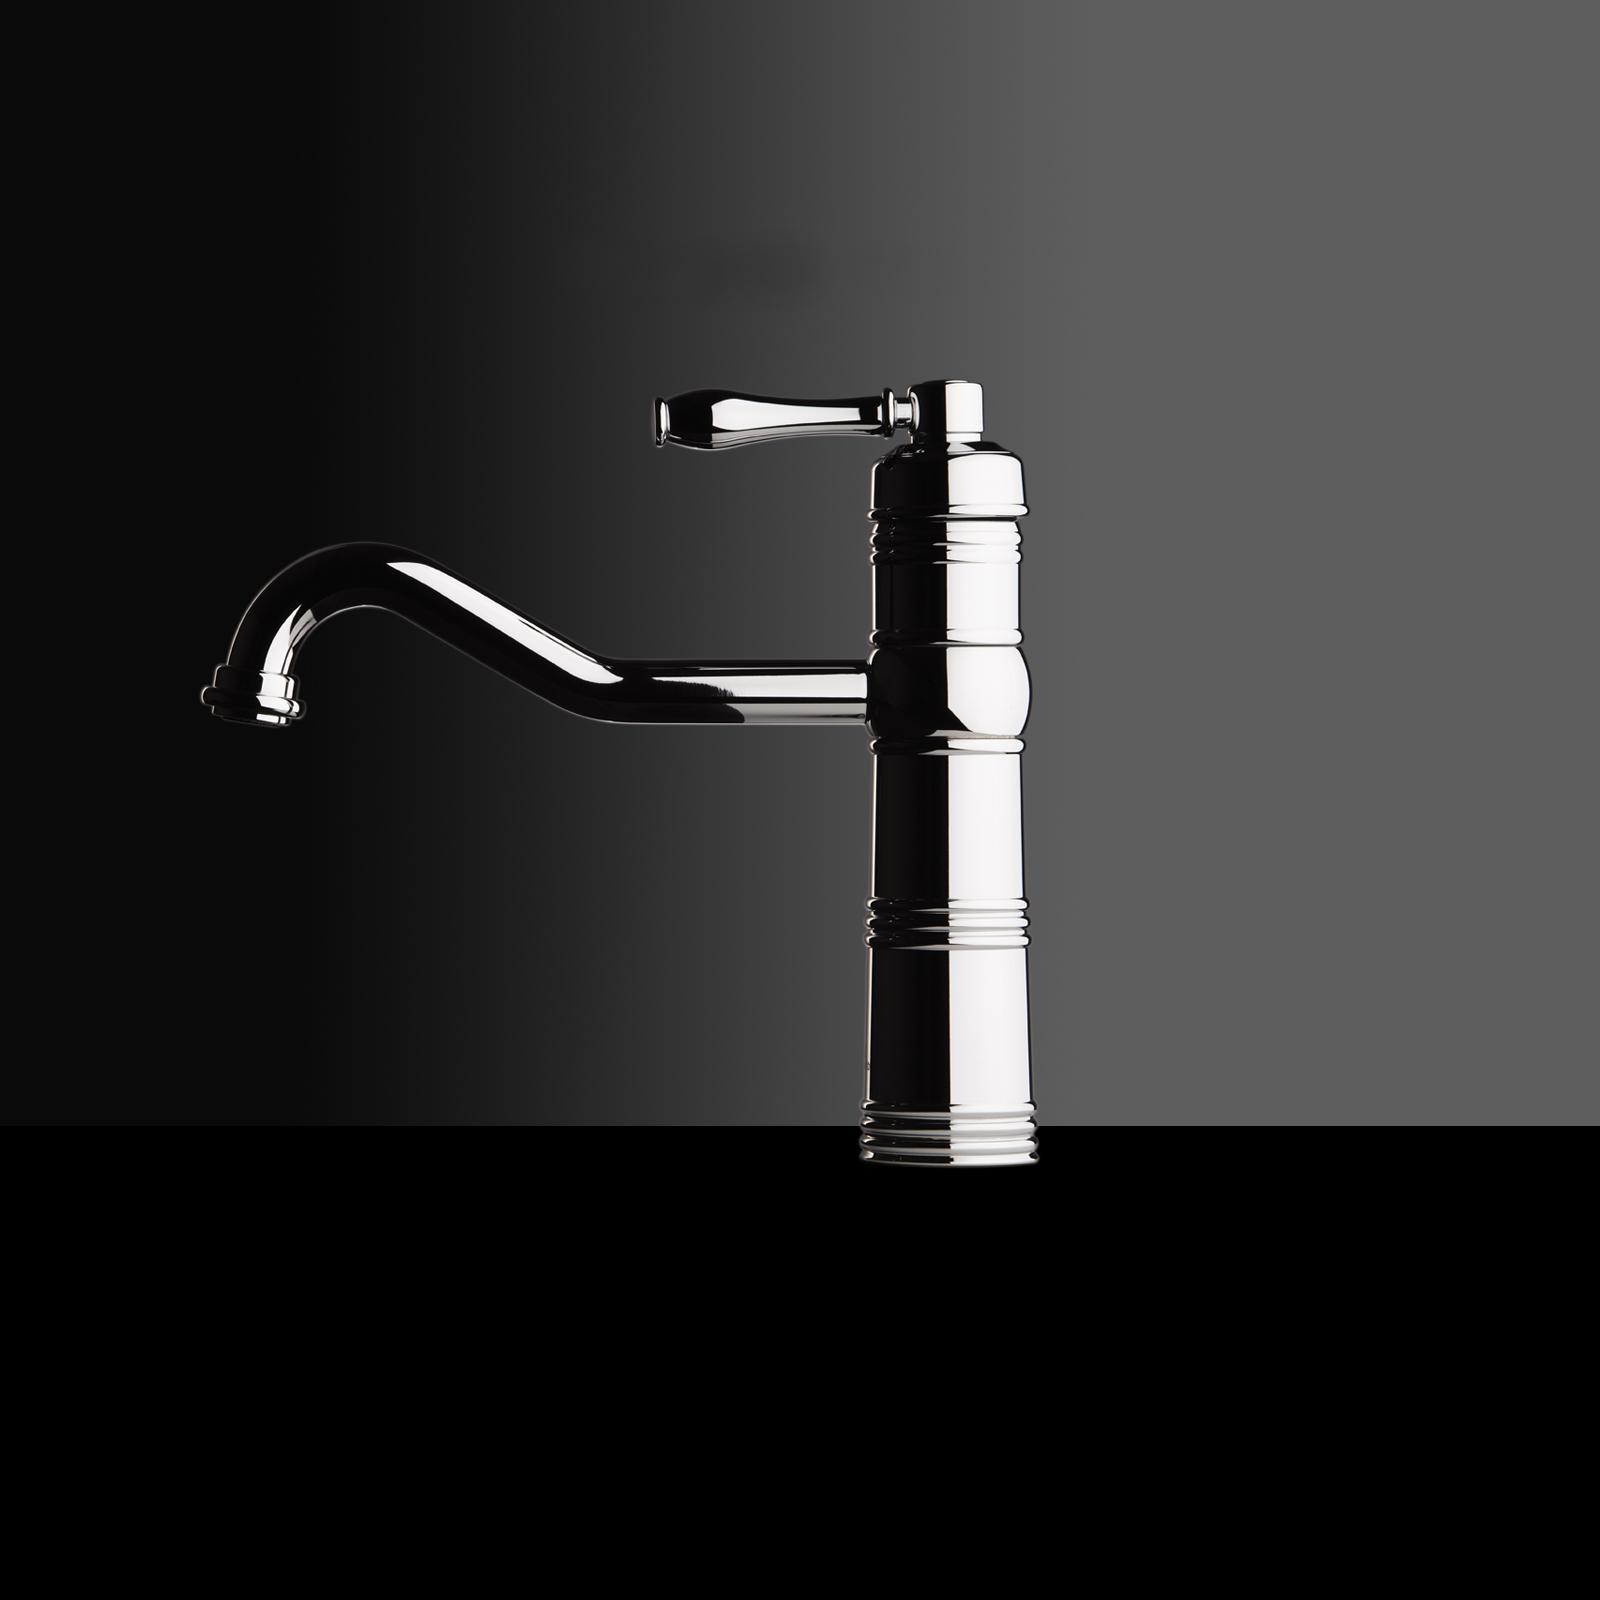 High-quality single lever tap Clémence - Chrome